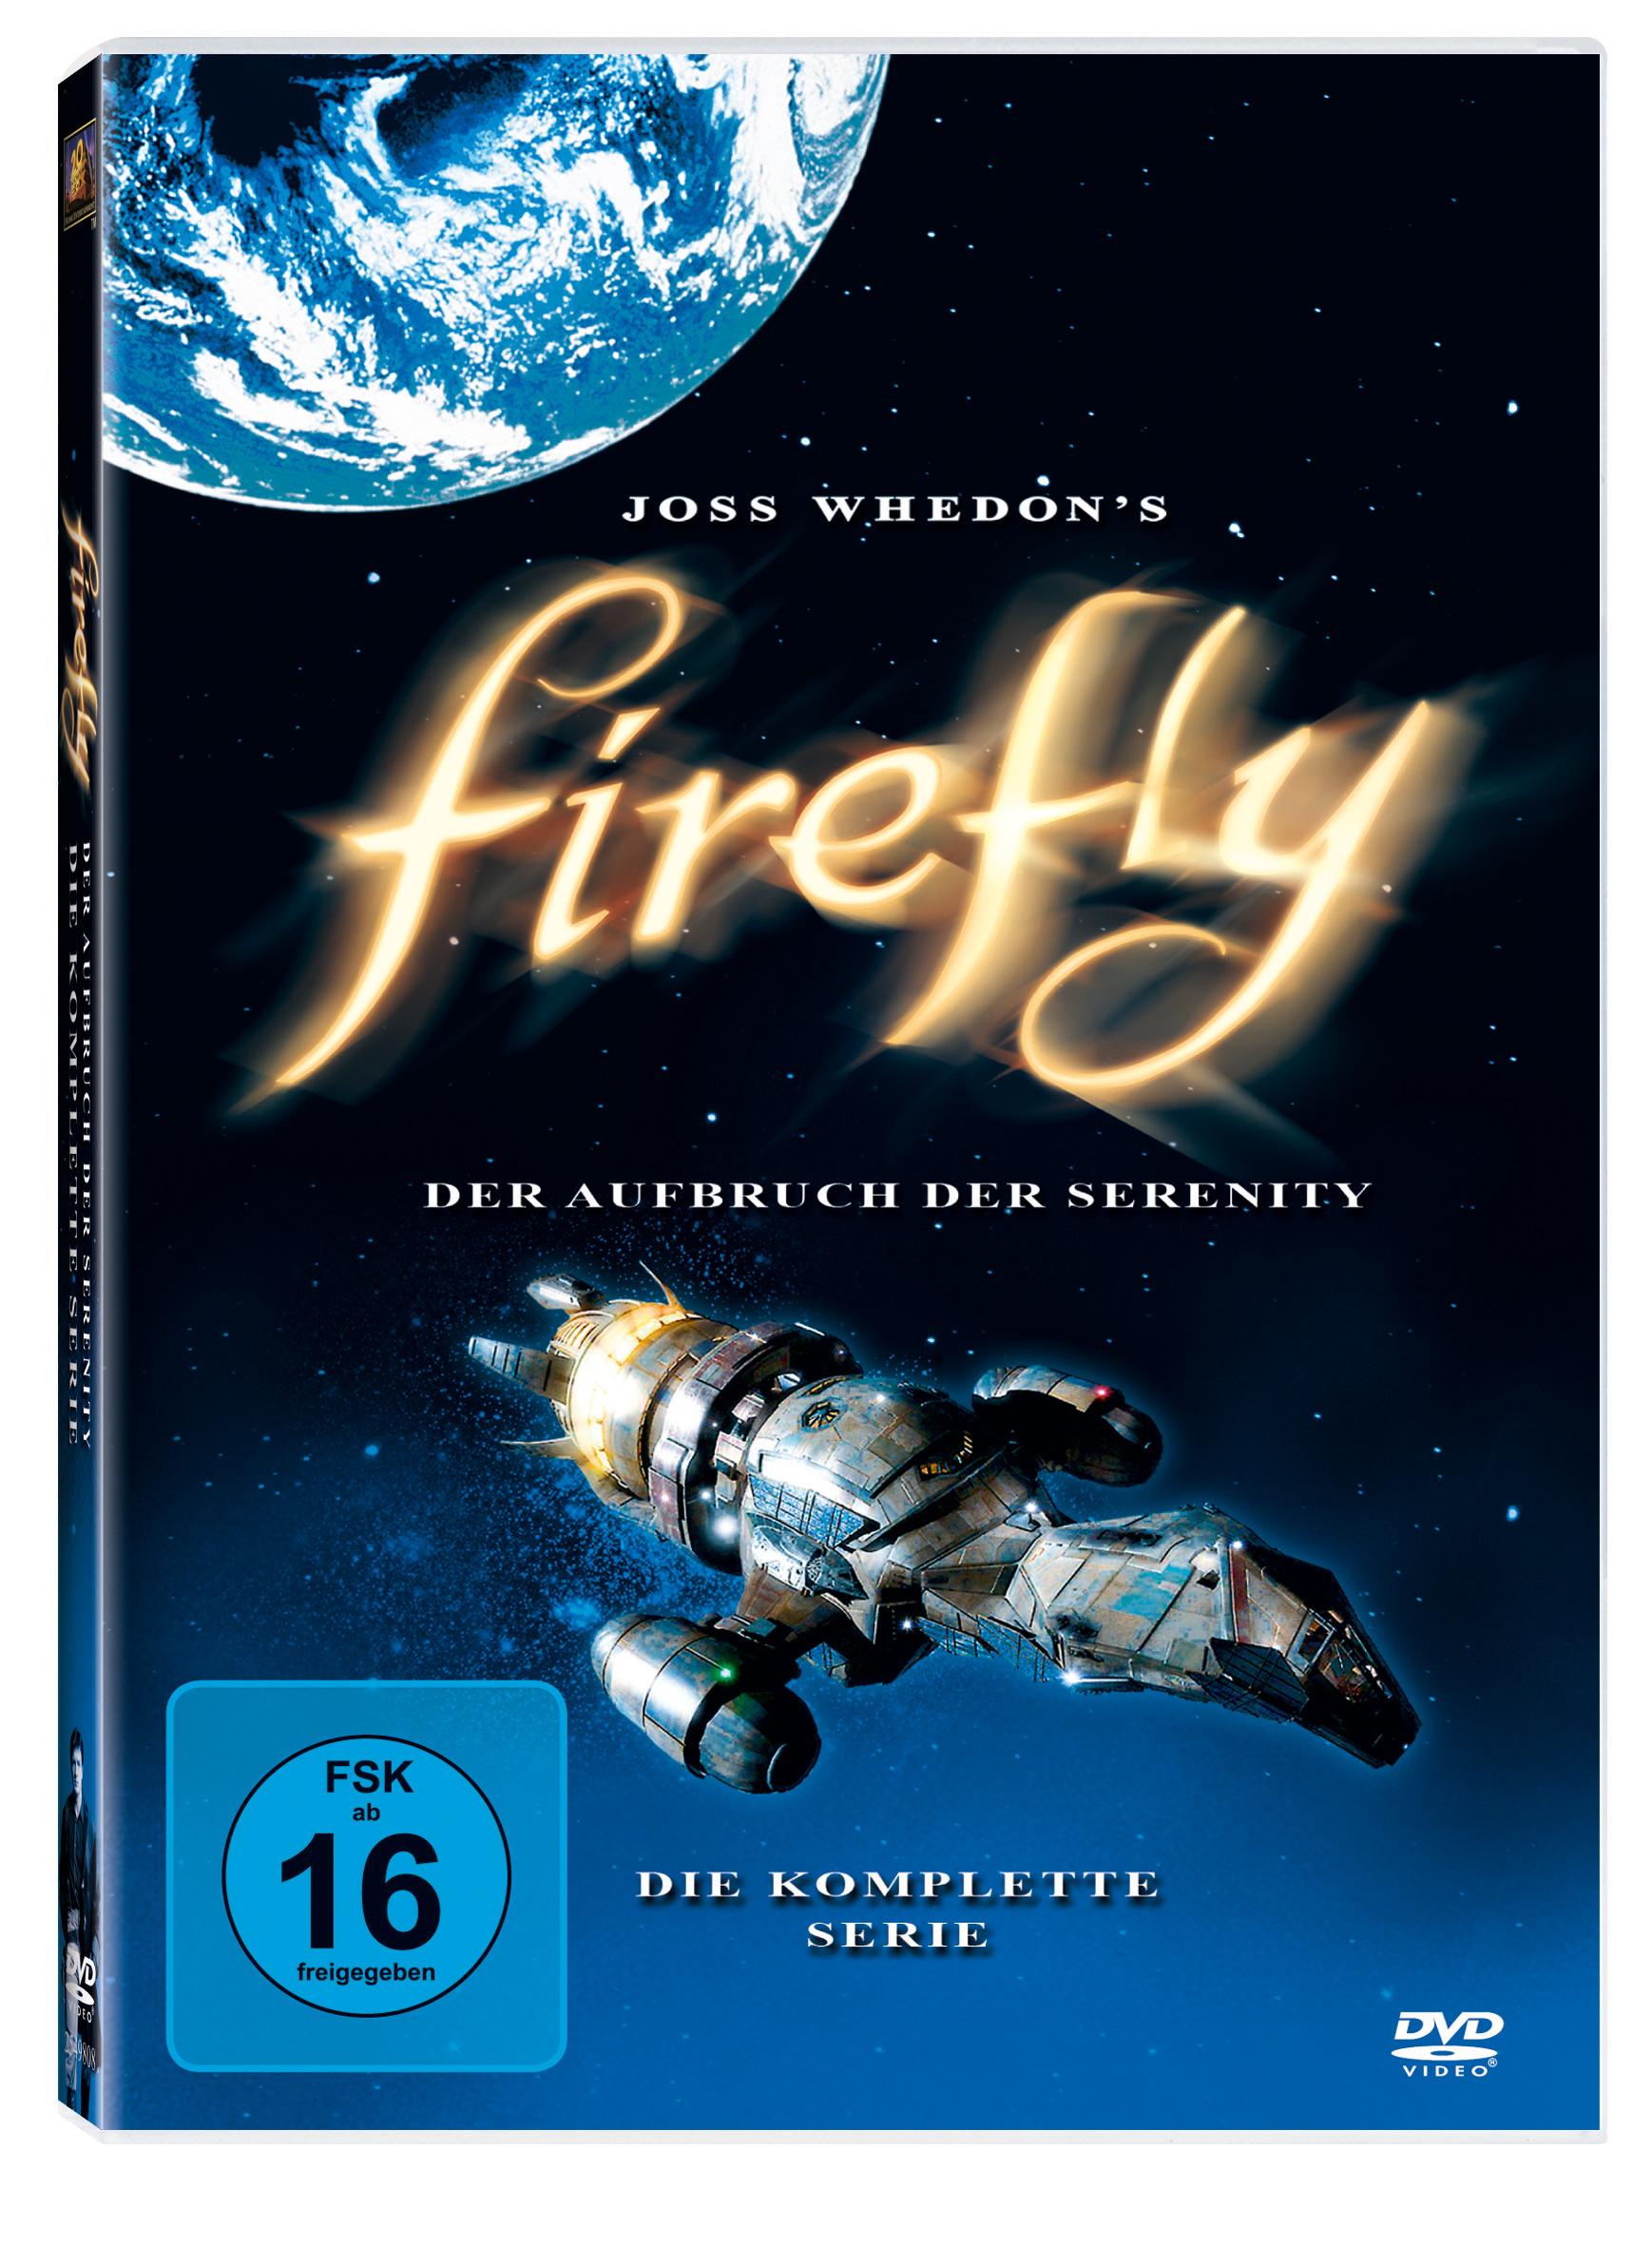 Image of Firefly - Die komplette Serie